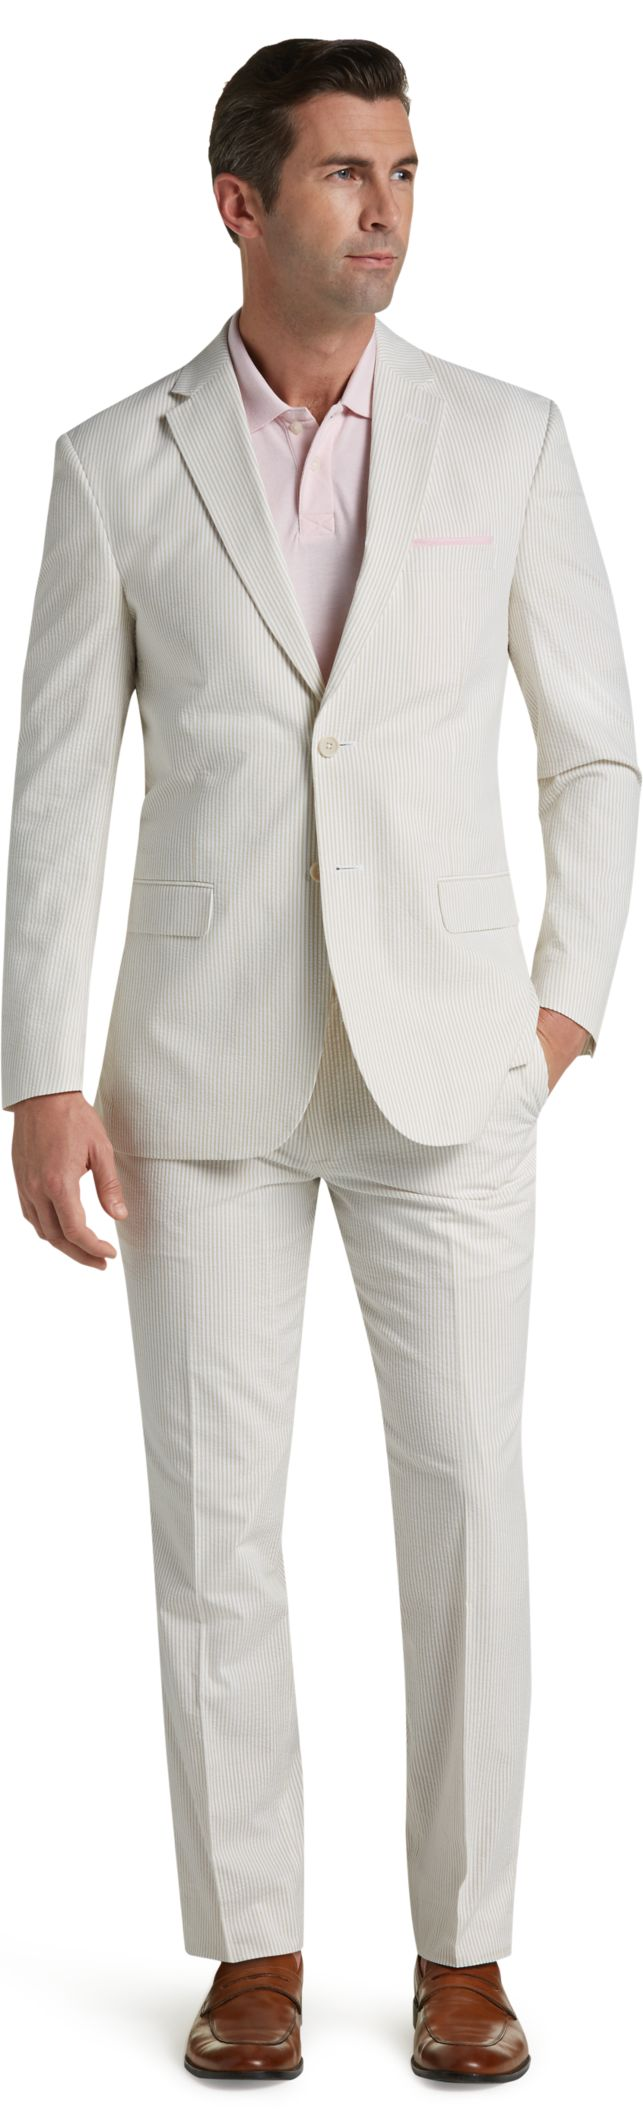 Men's Suits | Black, Navy & Grey Business Suits | JoS. A. Bank